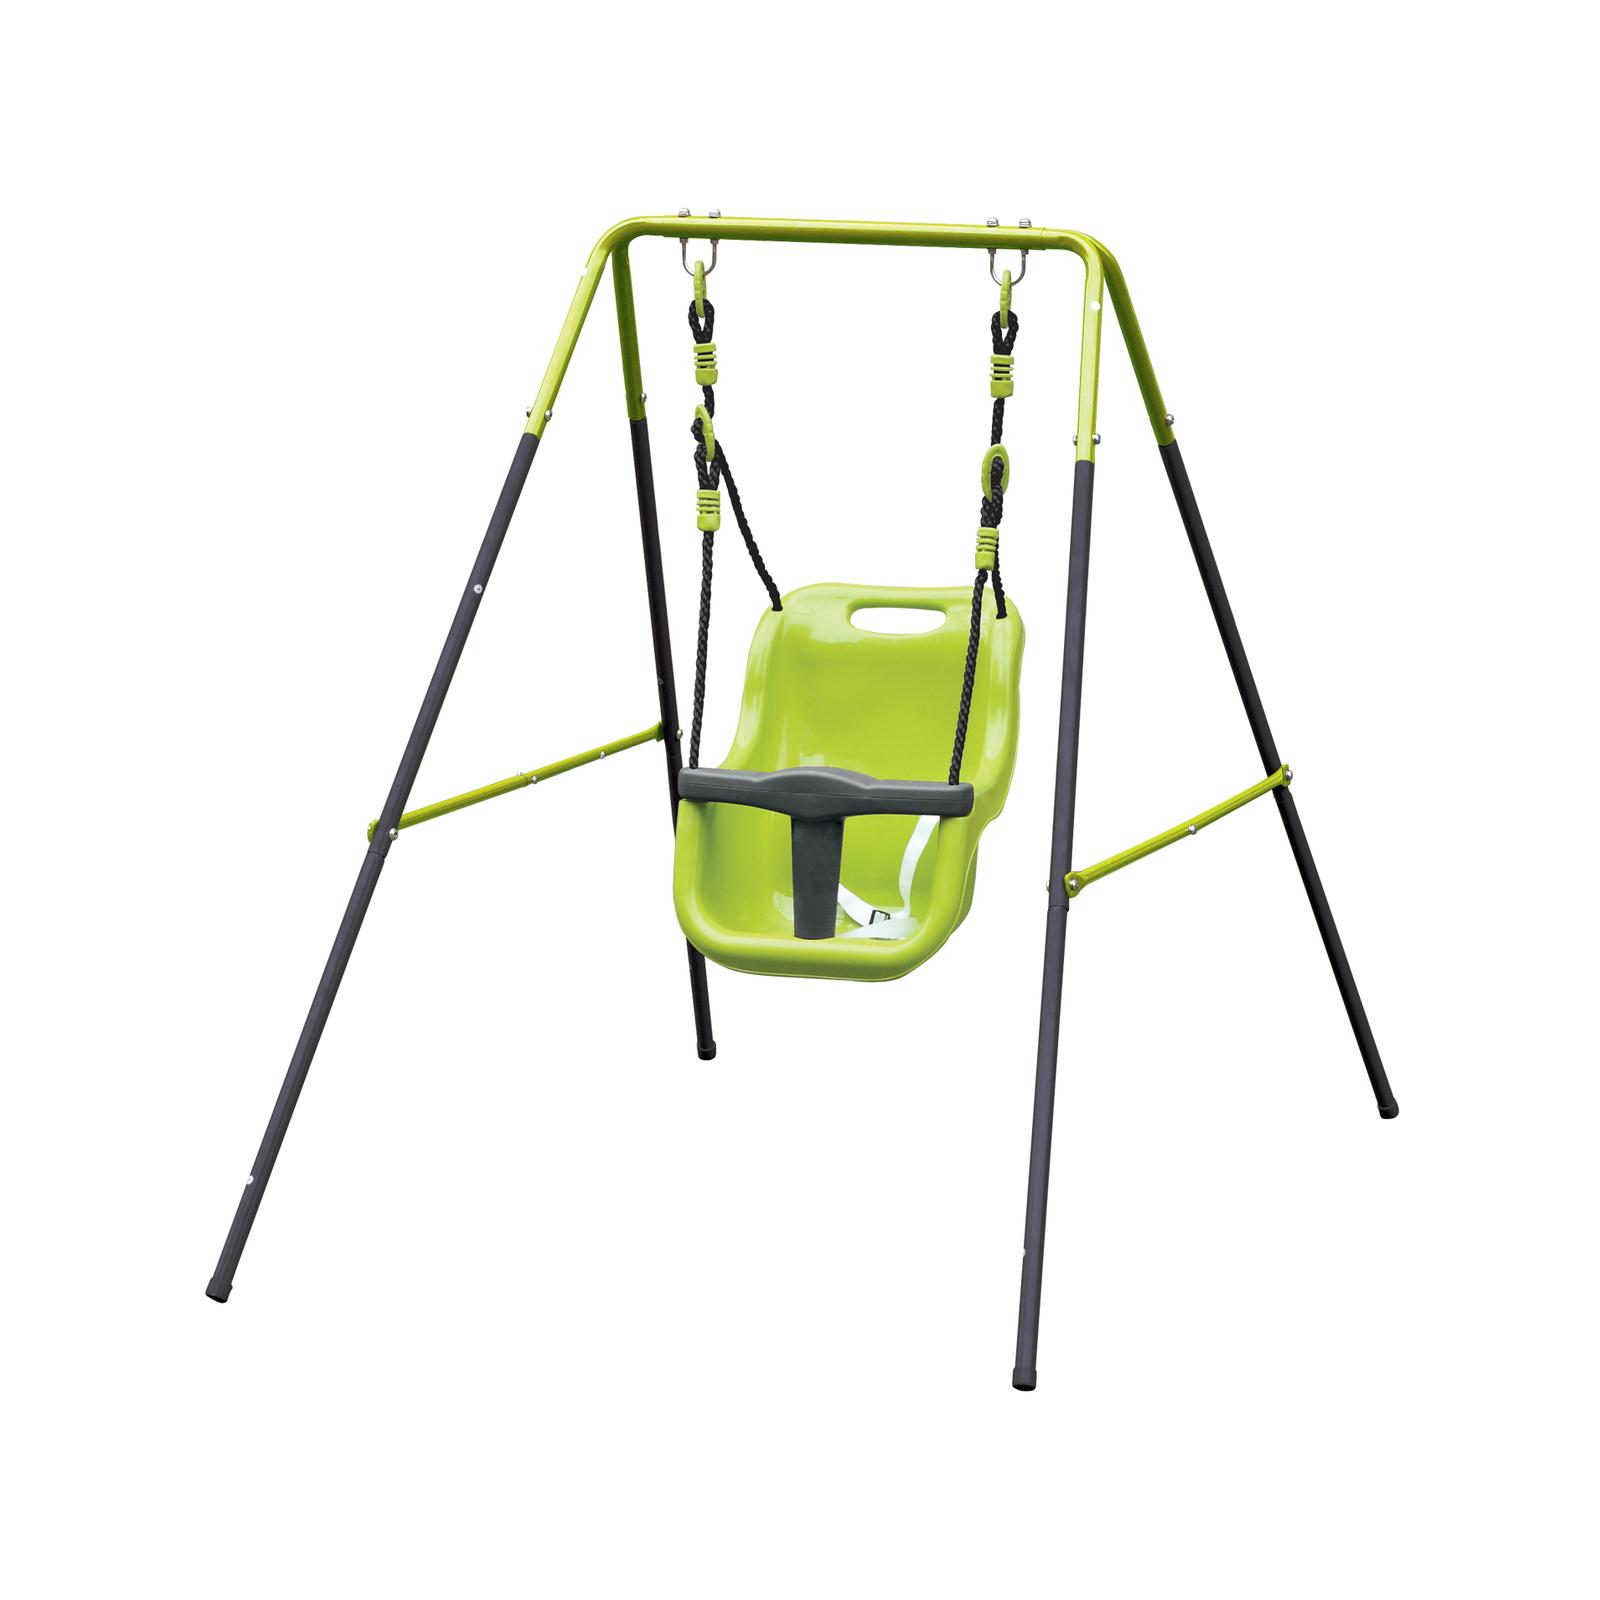 Swing Slide Climb Baby Swing Set